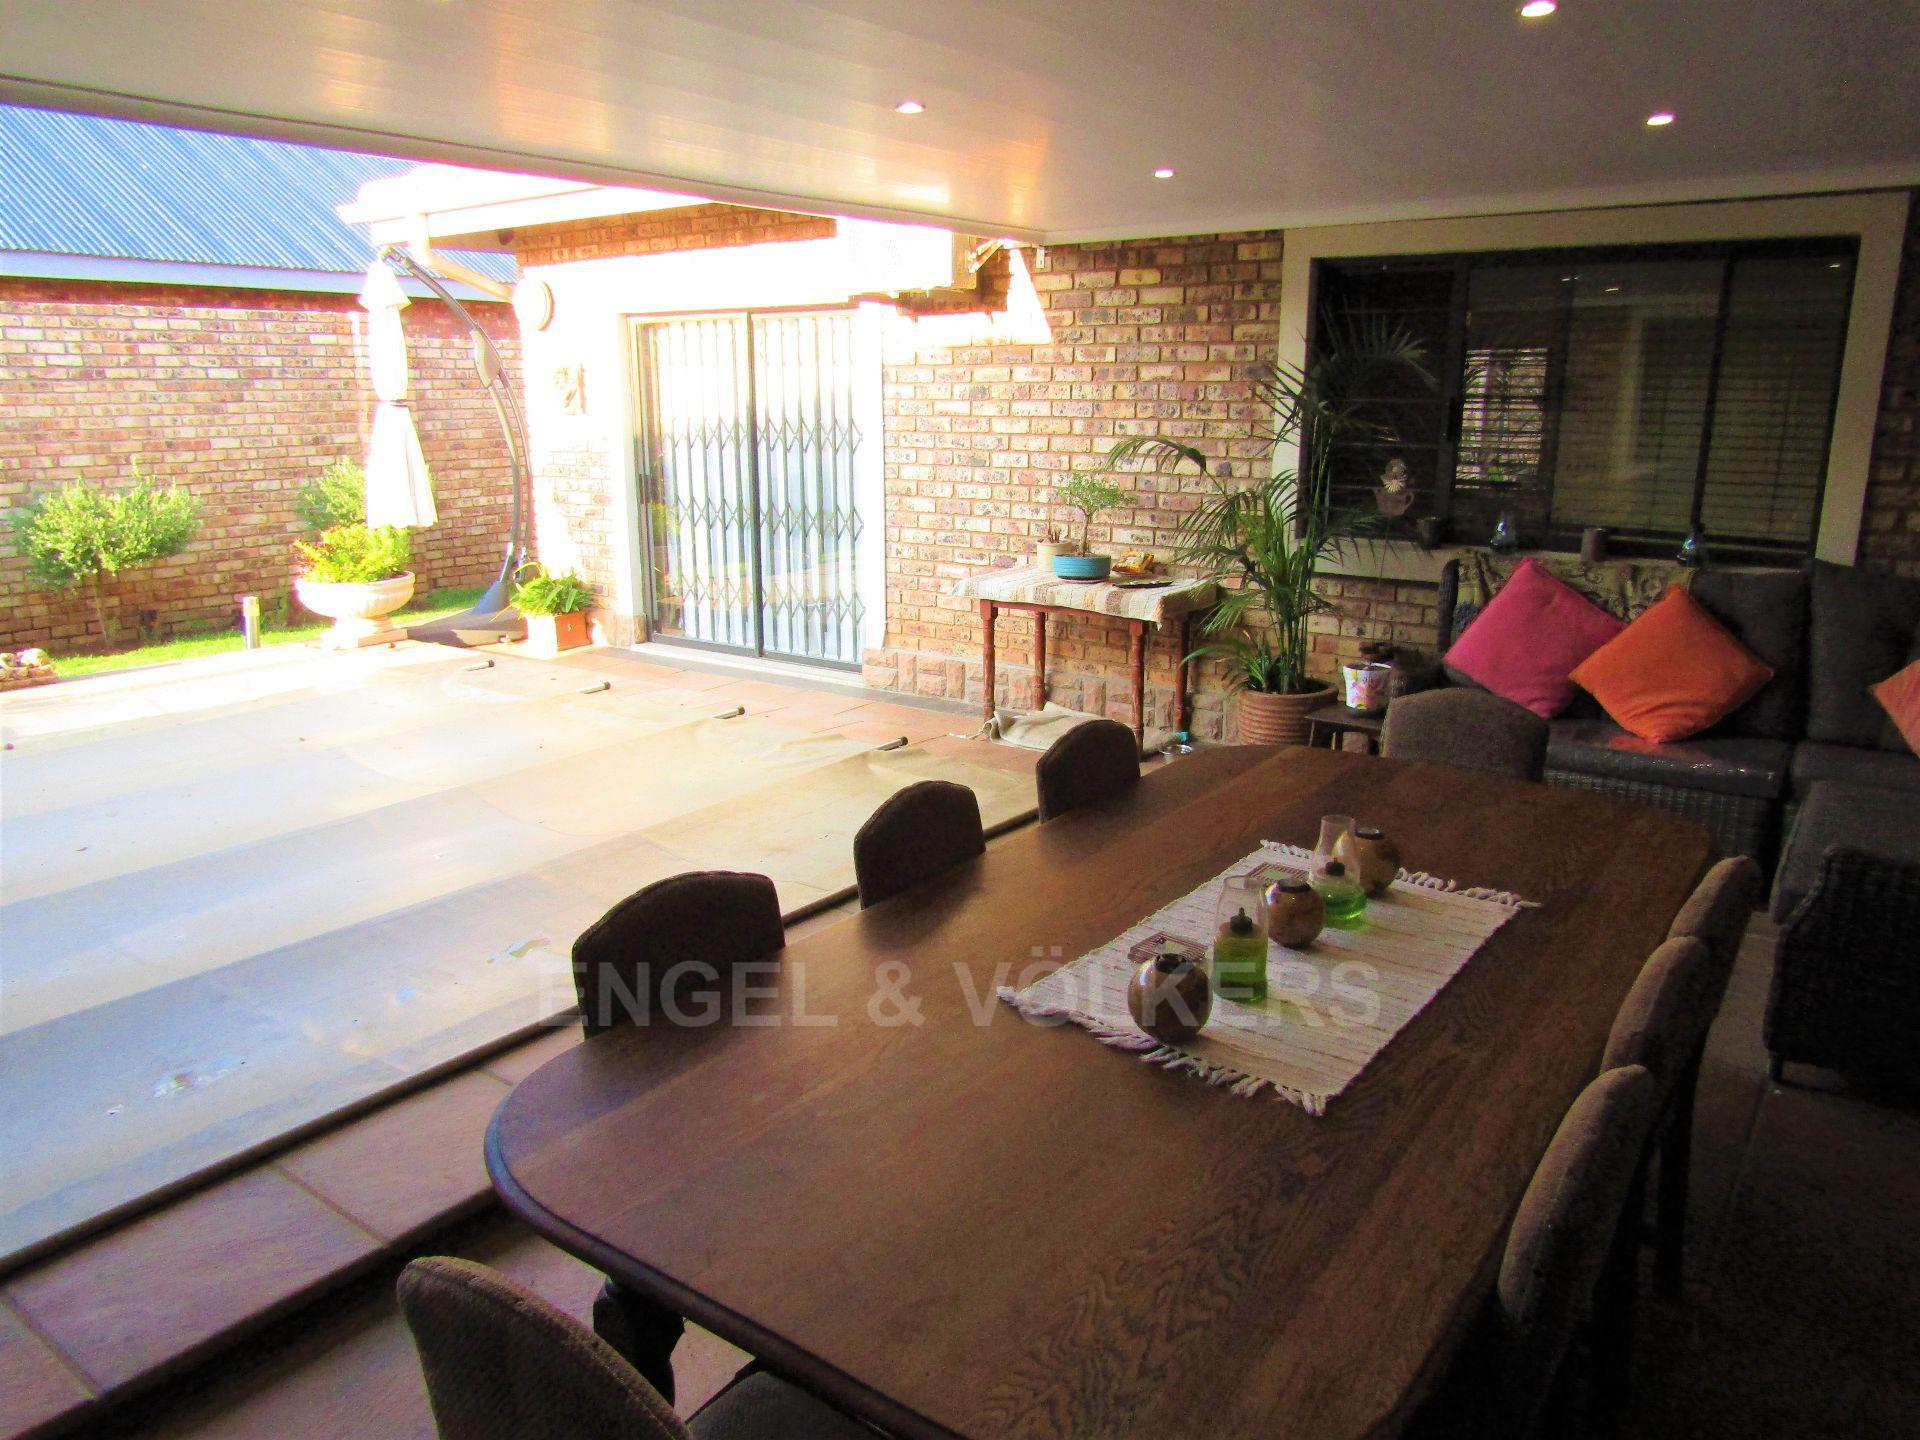 Lifestyle Estate property for sale. Ref No: 13458759. Picture no 12